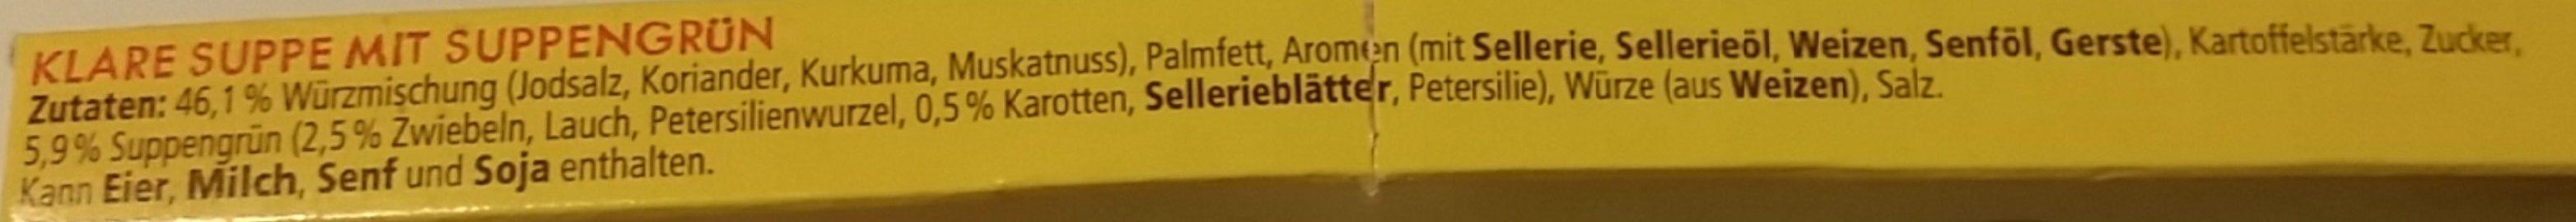 Klare Suppe - Inhaltsstoffe - de